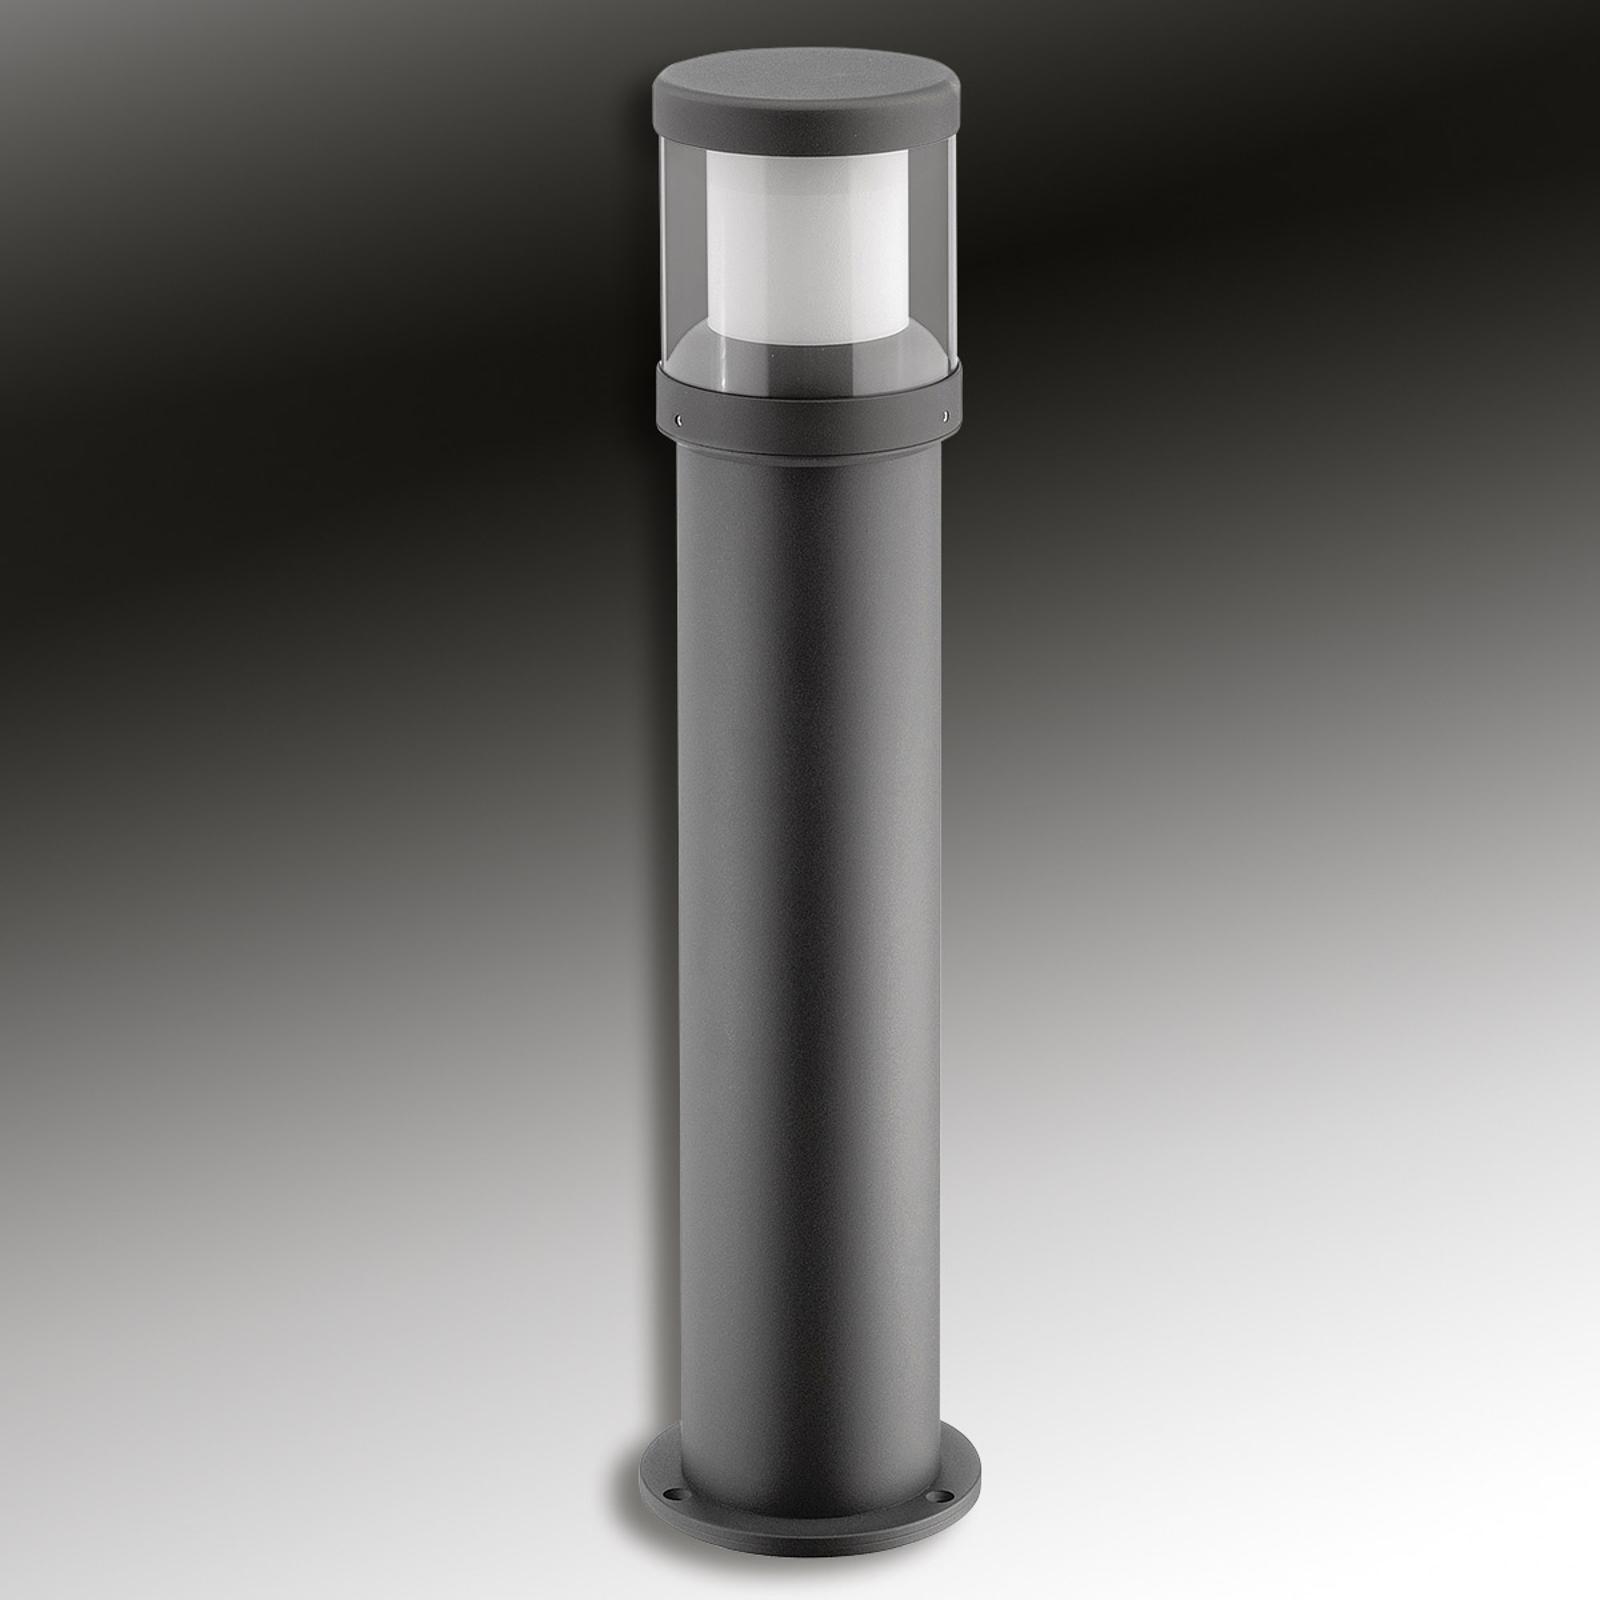 Borne lumineuse LED robuste Levent - IP65 67 cm